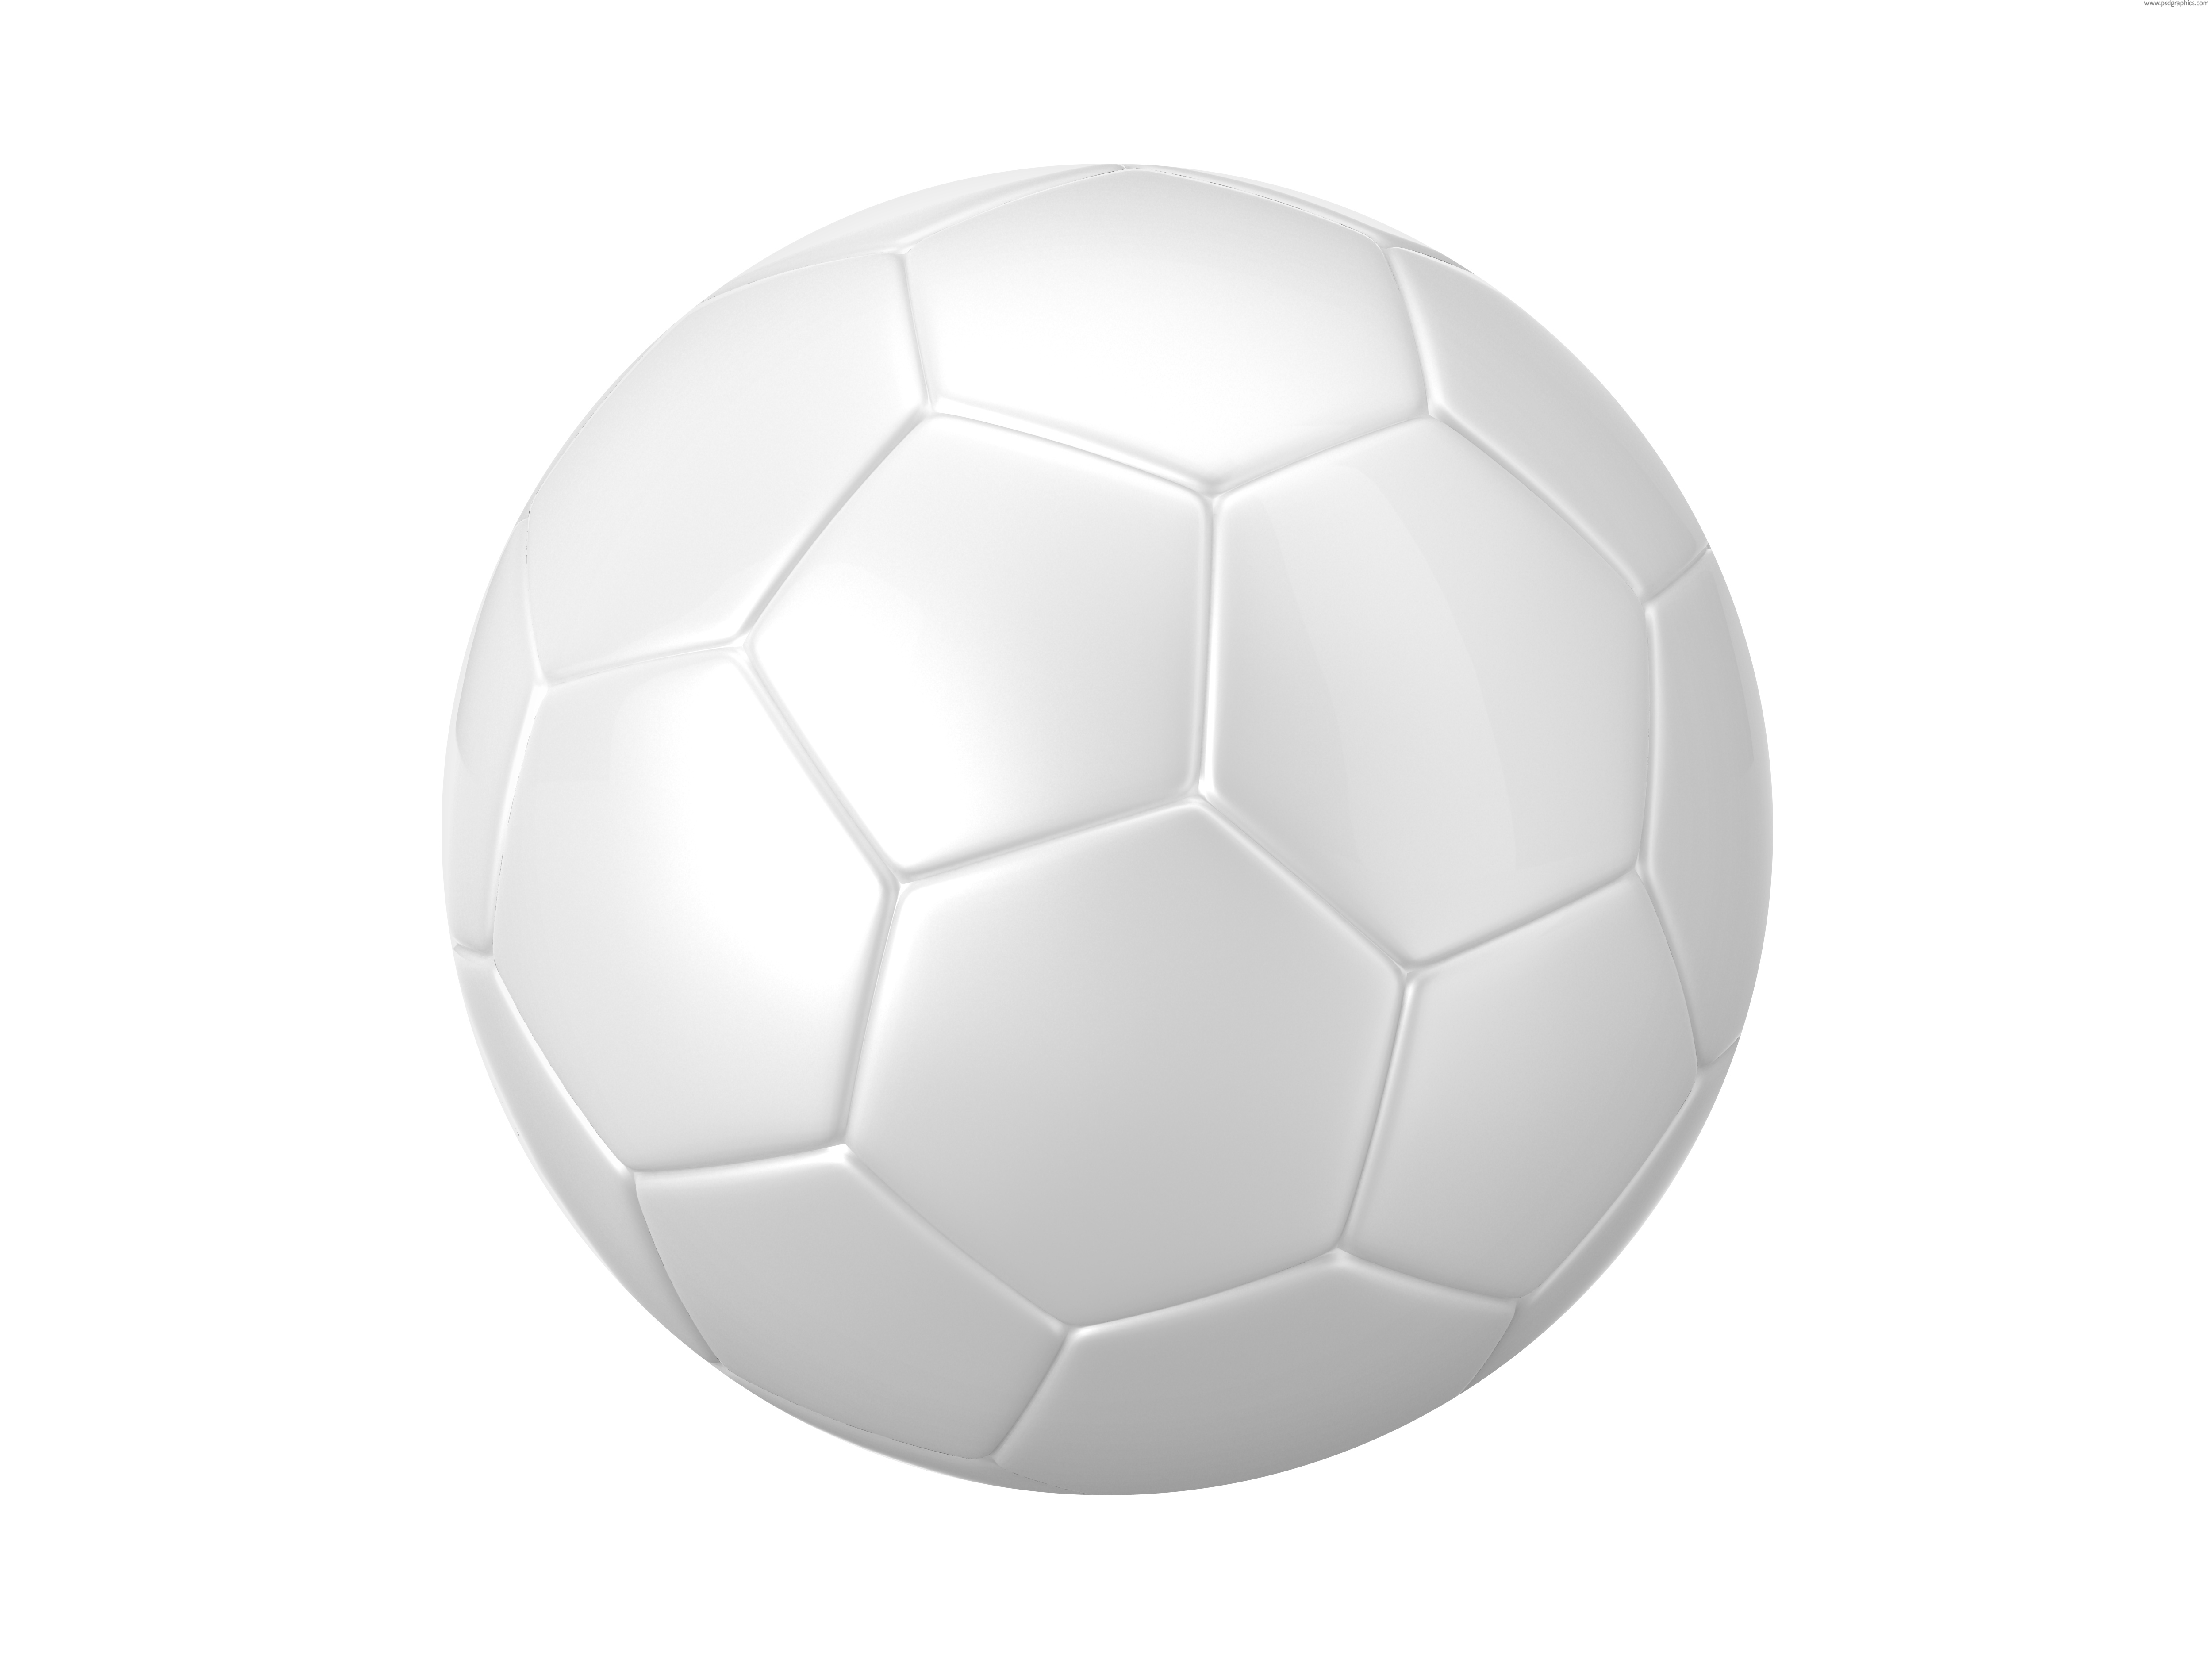 Black and white football (soccer) balls | PSDGraphics